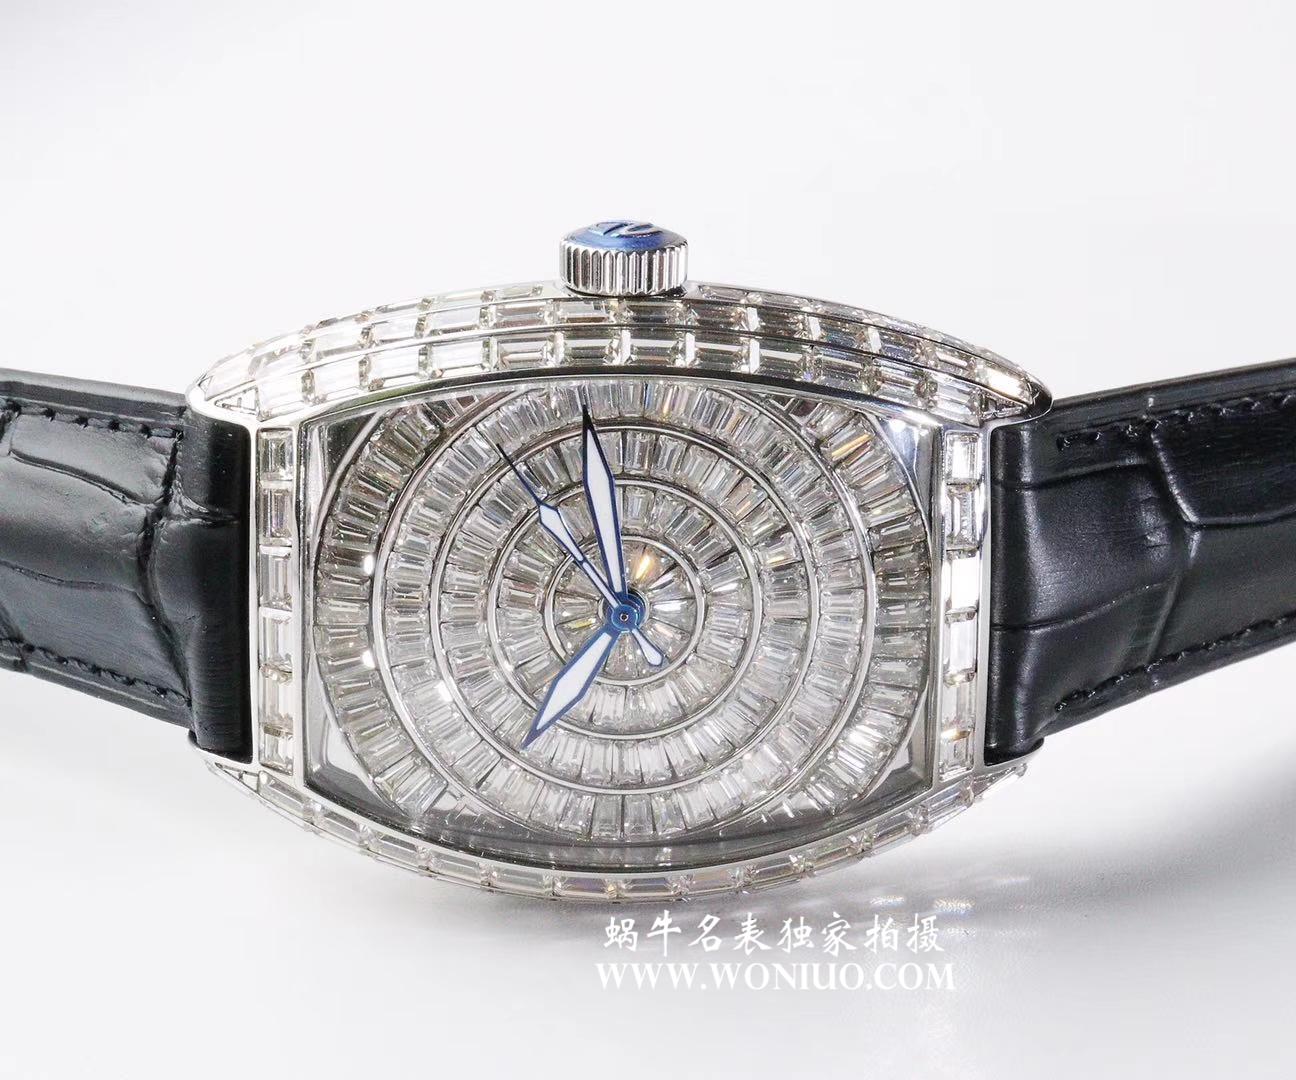 【DM厂顶级复刻手表】原版复刻 FM法兰克穆勒GRAND COMPLICATIONS系列8889 奢华版全方钻新款上市 / 法穆兰FL06